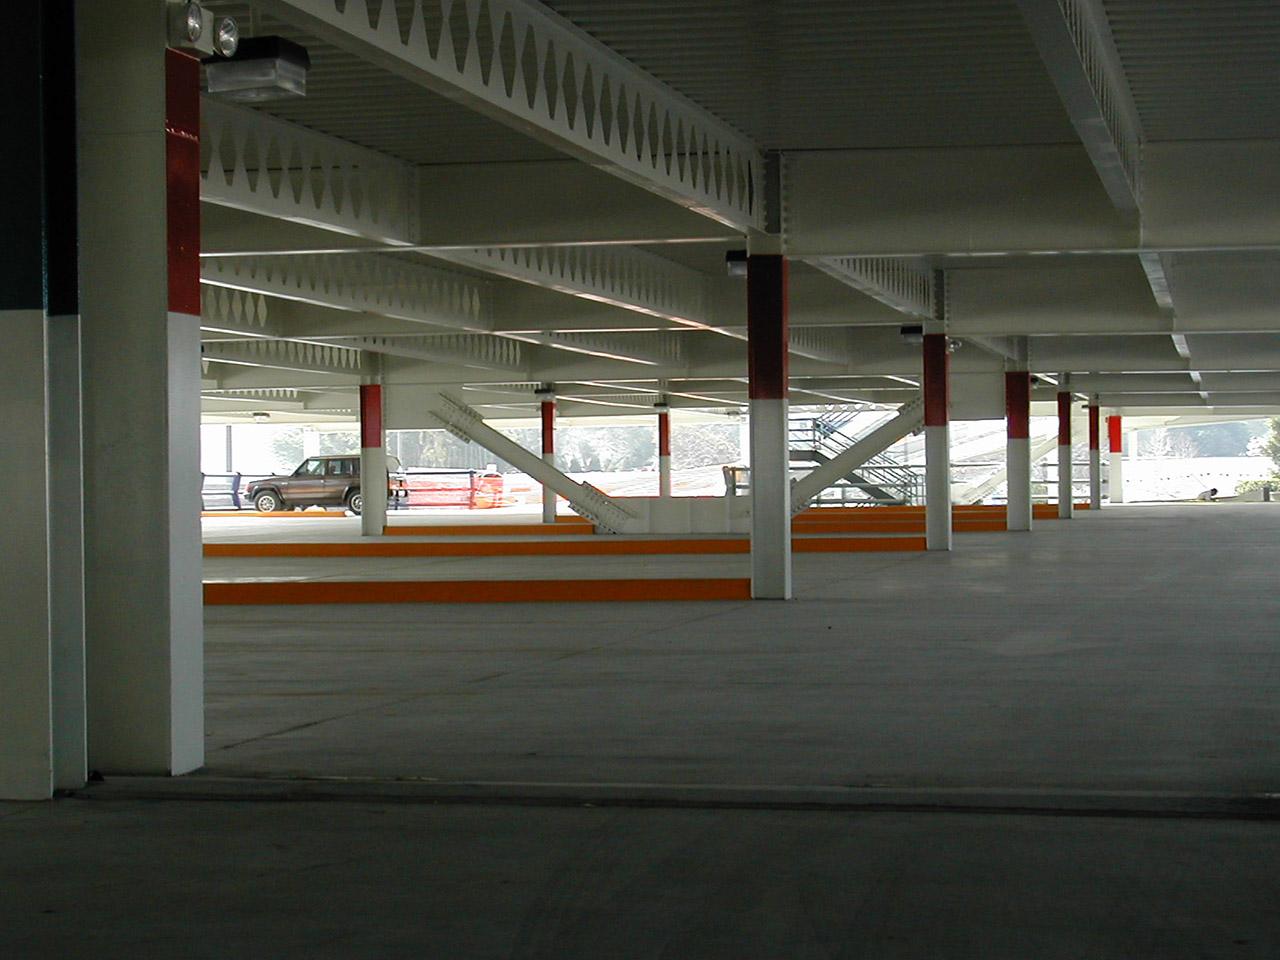 estacionamiento-plaza-rio-45